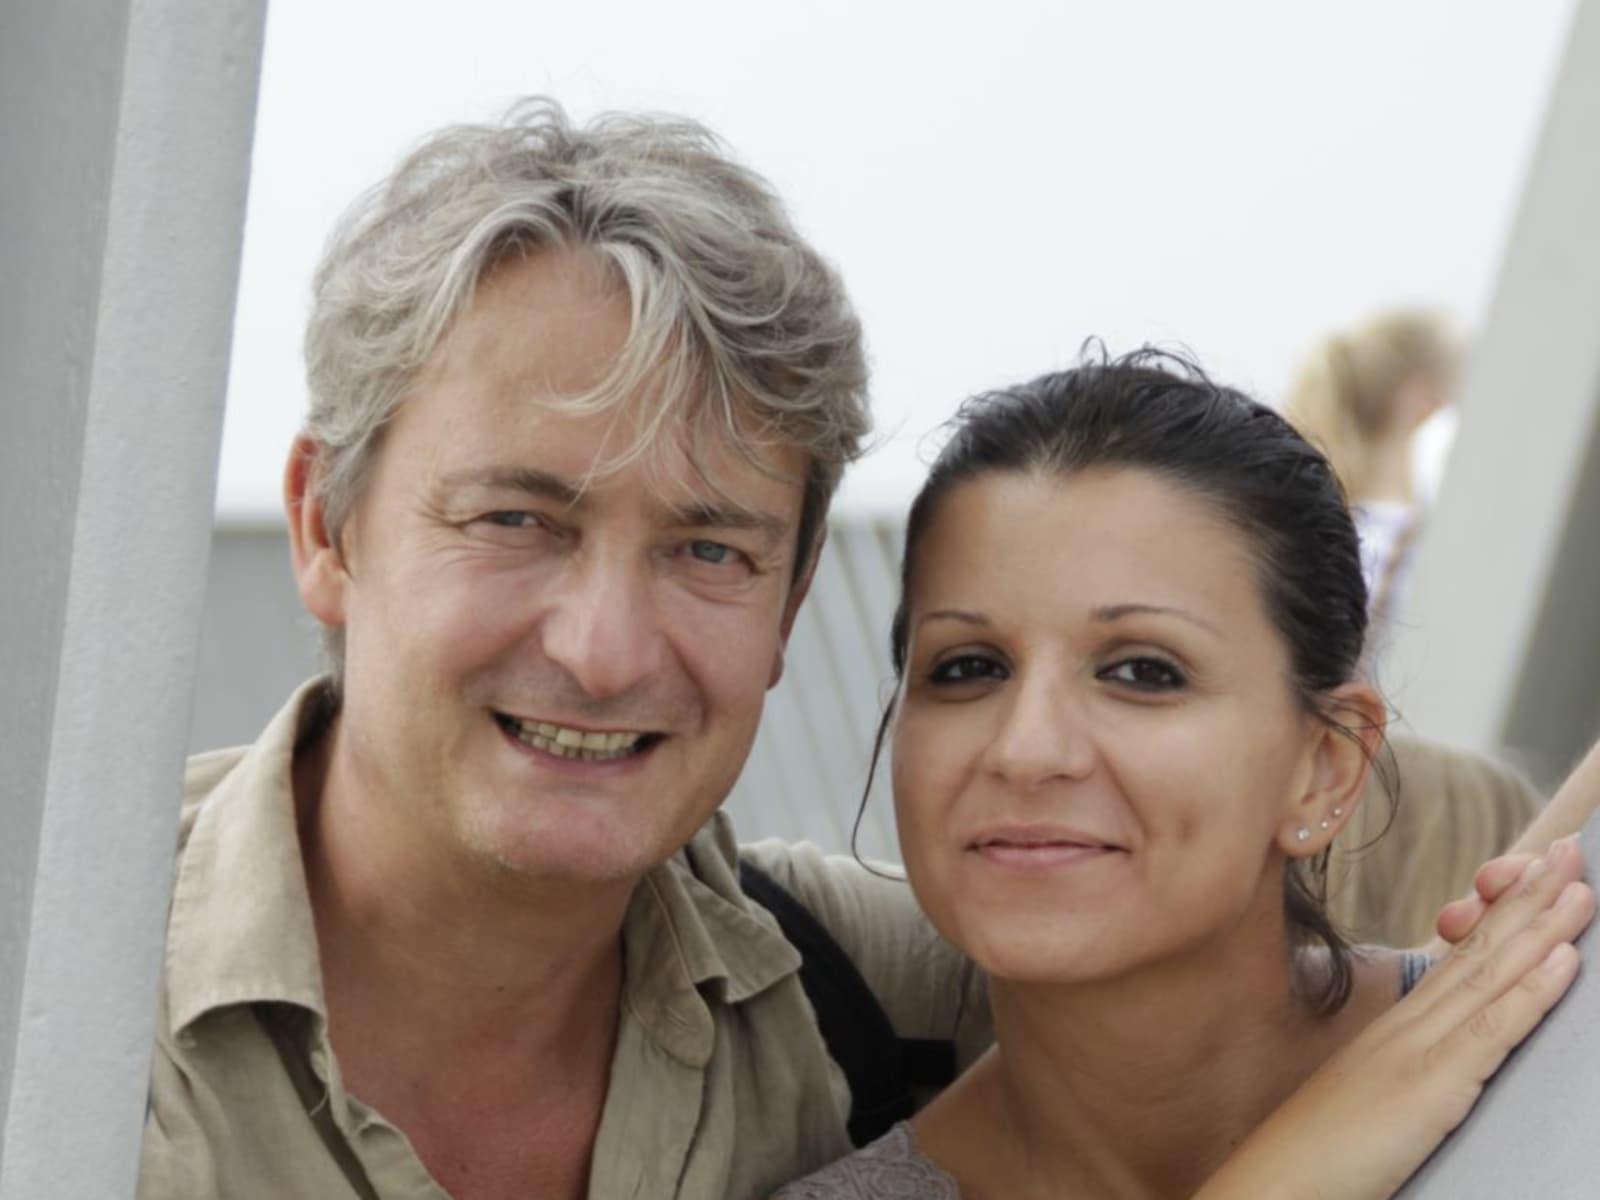 Fabiola & Ian james from Lecce, Italy